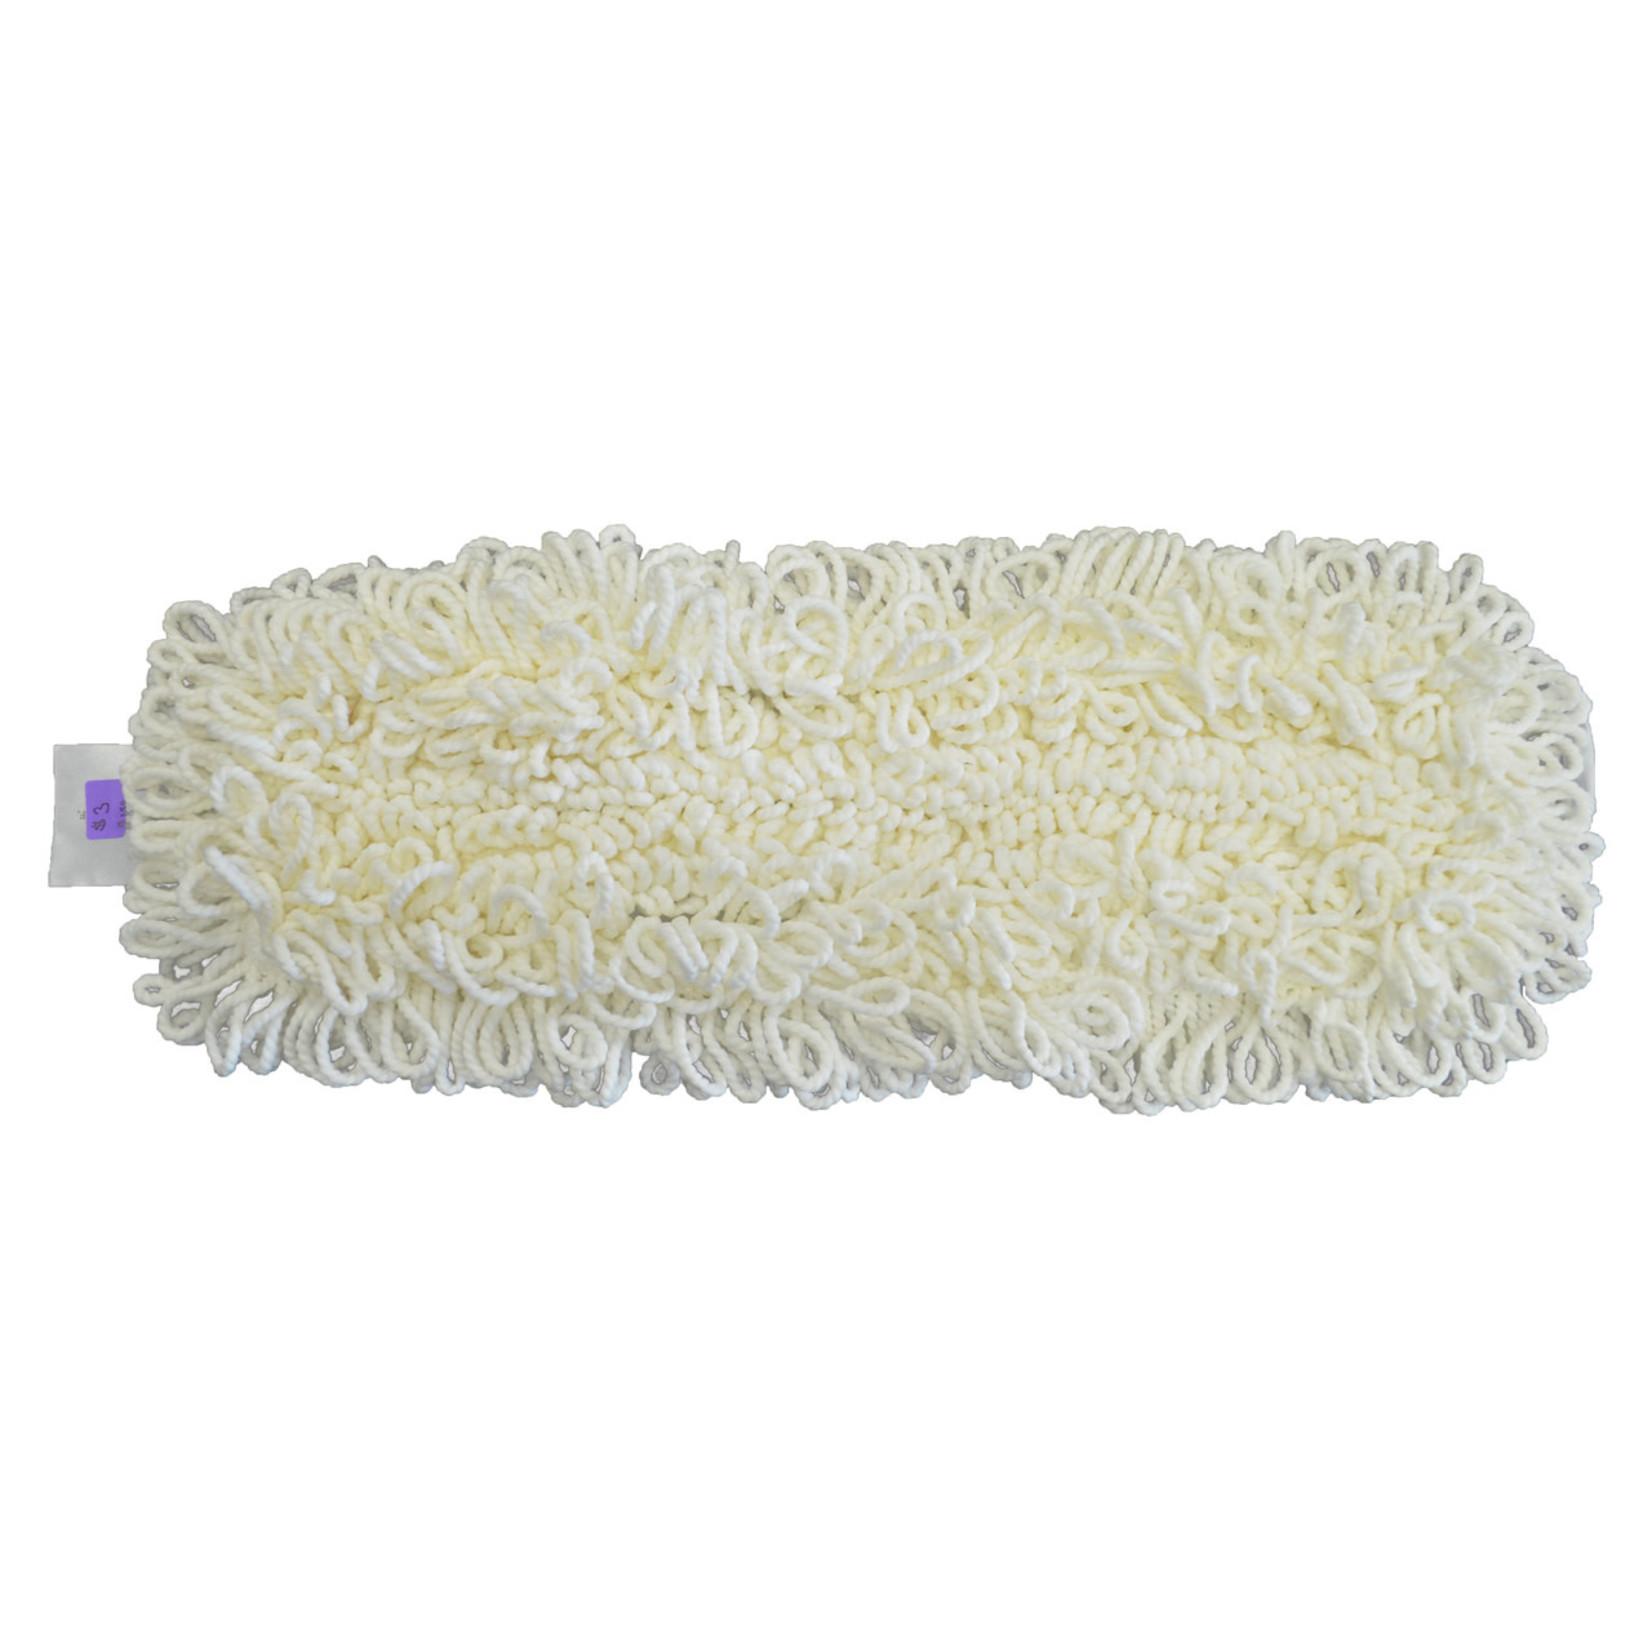 Shaggy Flat Mop Head